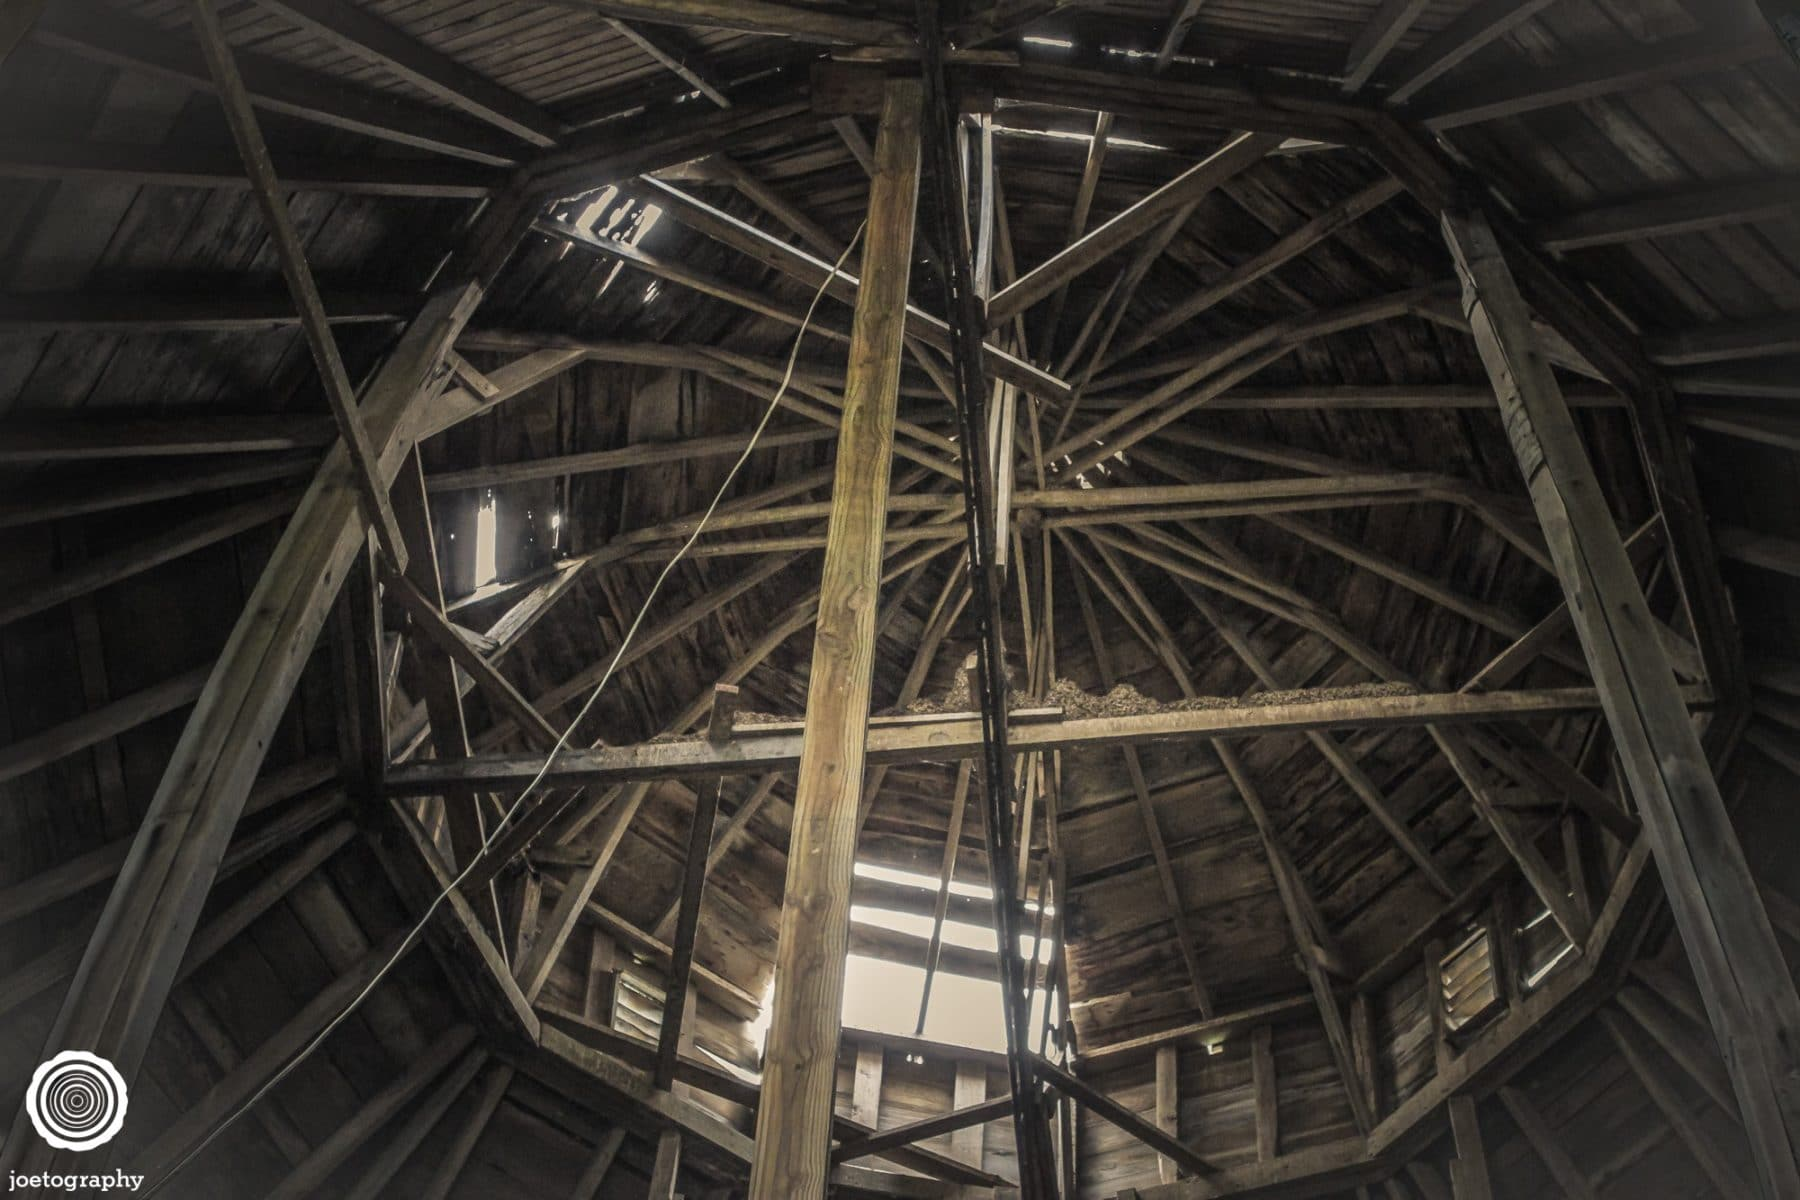 polygonal-barn-architecture-photos-shelbyville-indiana-9